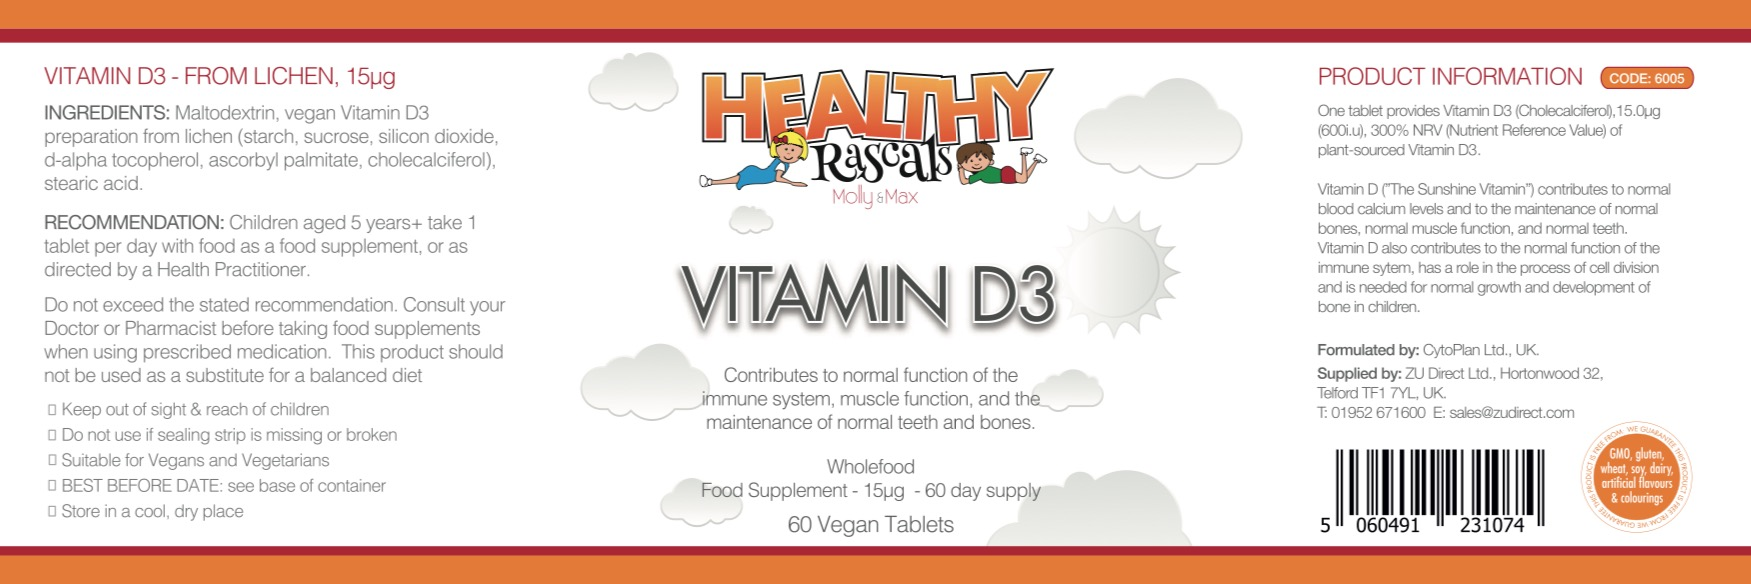 Heathy Rascals - Vitamin D3 - Label